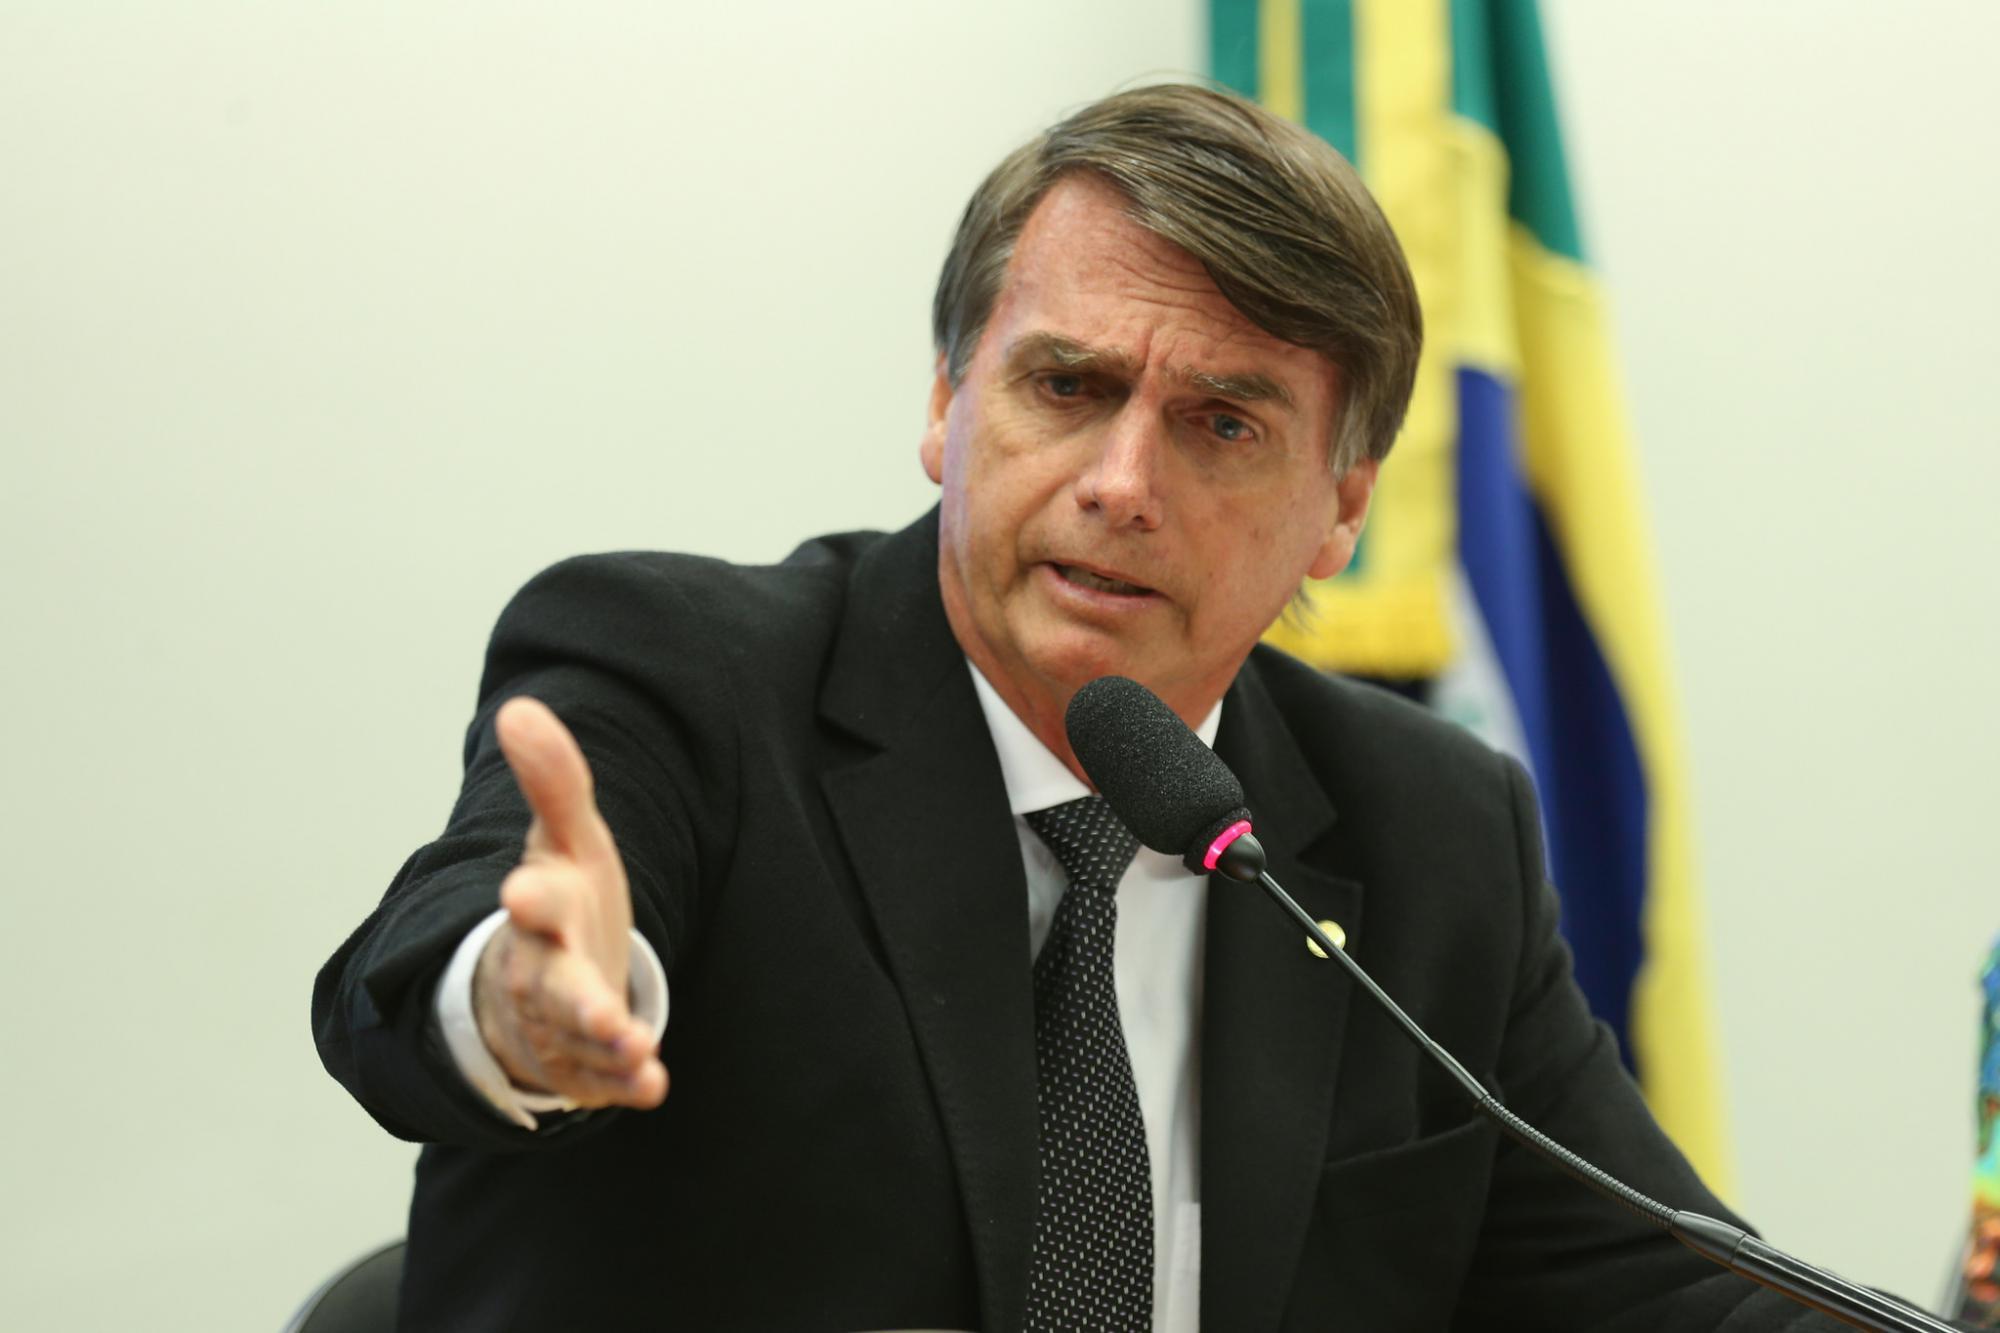 Jacir Bolsonaro